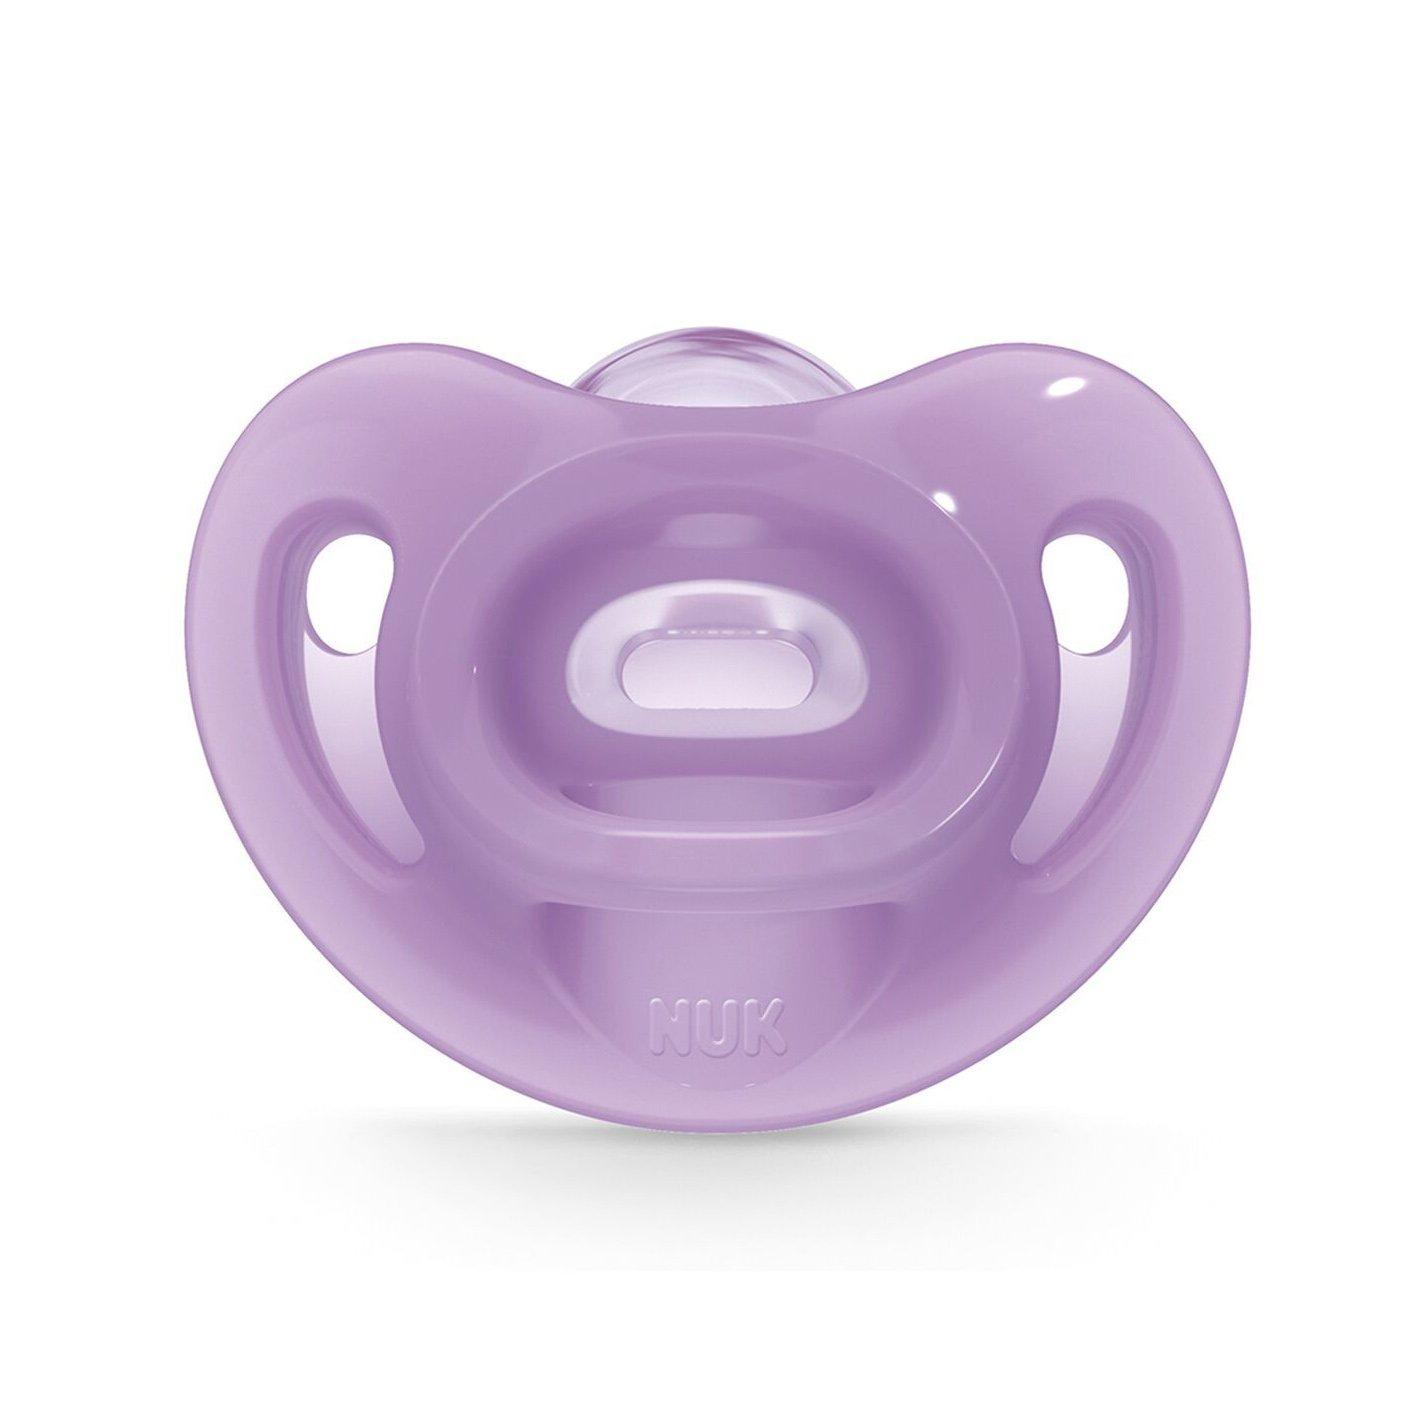 Nuk Sensitive Πιπίλα Όλο Σιλικόνη Εξαιρετικά Μαλακή & Εύκαμπτη 1 Τεμάχιο – 0-6 Μηνών Μωβ